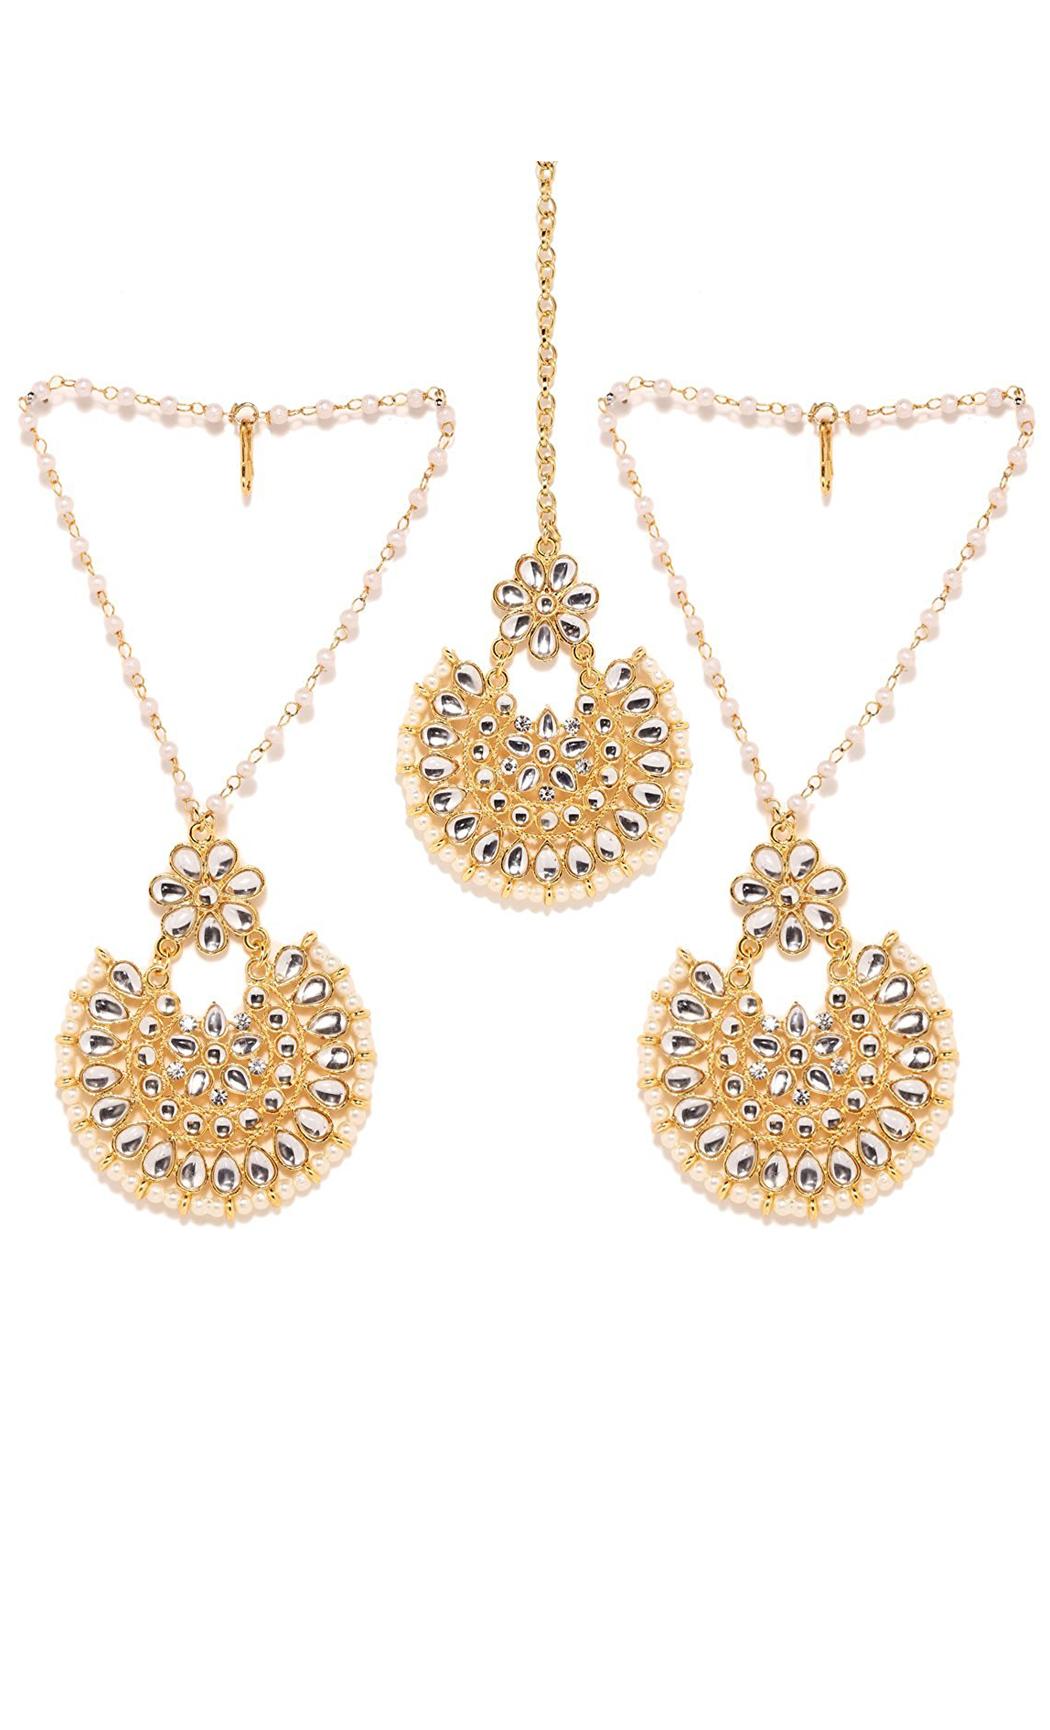 Kundan and Pearl Earrings with Ear Chains & Mangtika Set - Shop Online